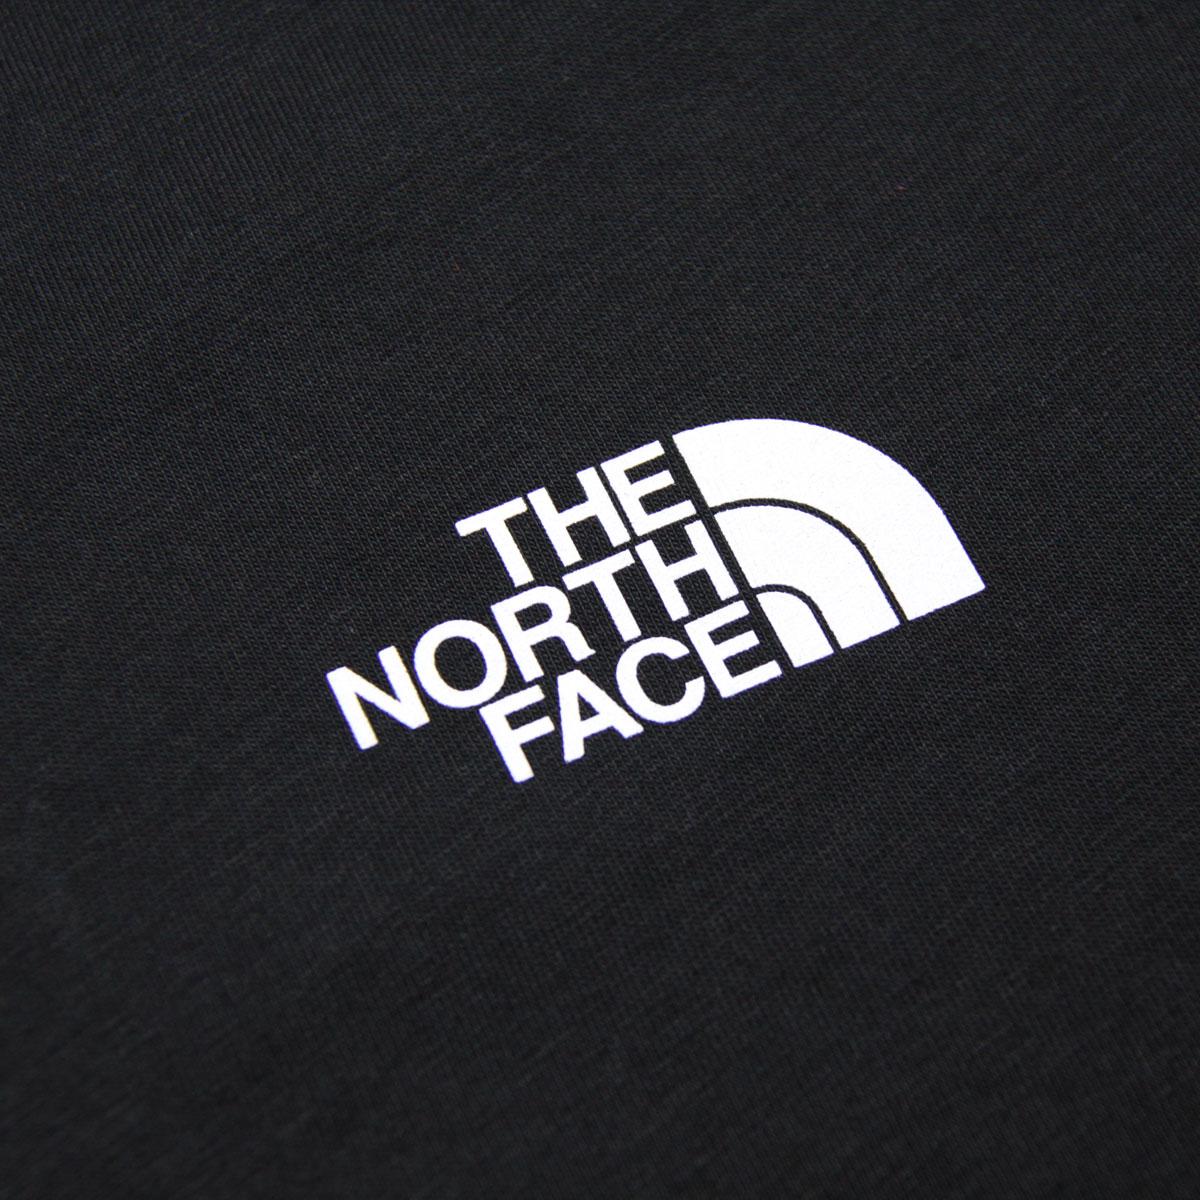 nothface_2